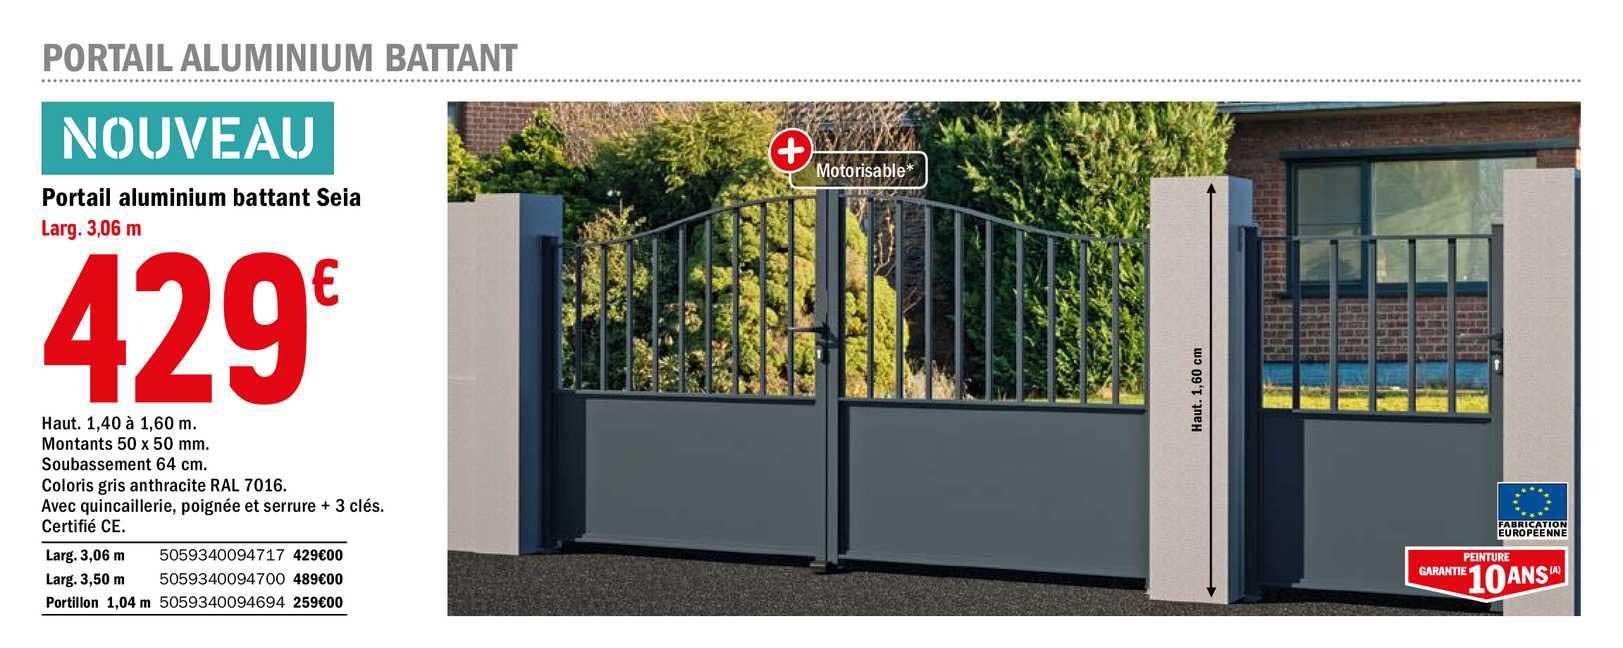 Offre Portail Aluminium Battant Seia Chez Brico Depot